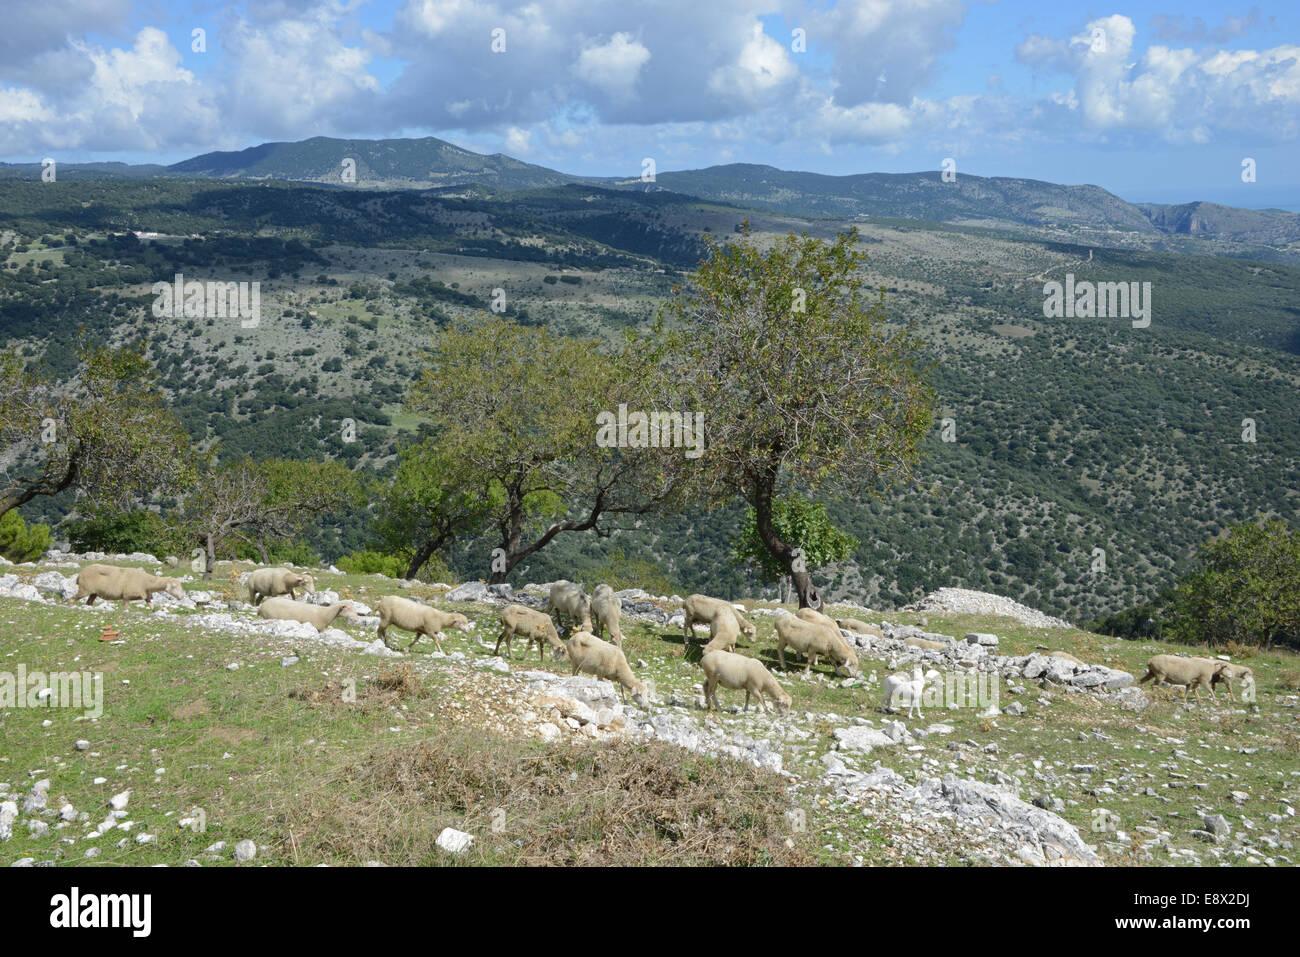 Flocks of sheep on mountainside, Monte Sant'Angelo, Gargano peninsula, Puglia, Italy - Stock Image